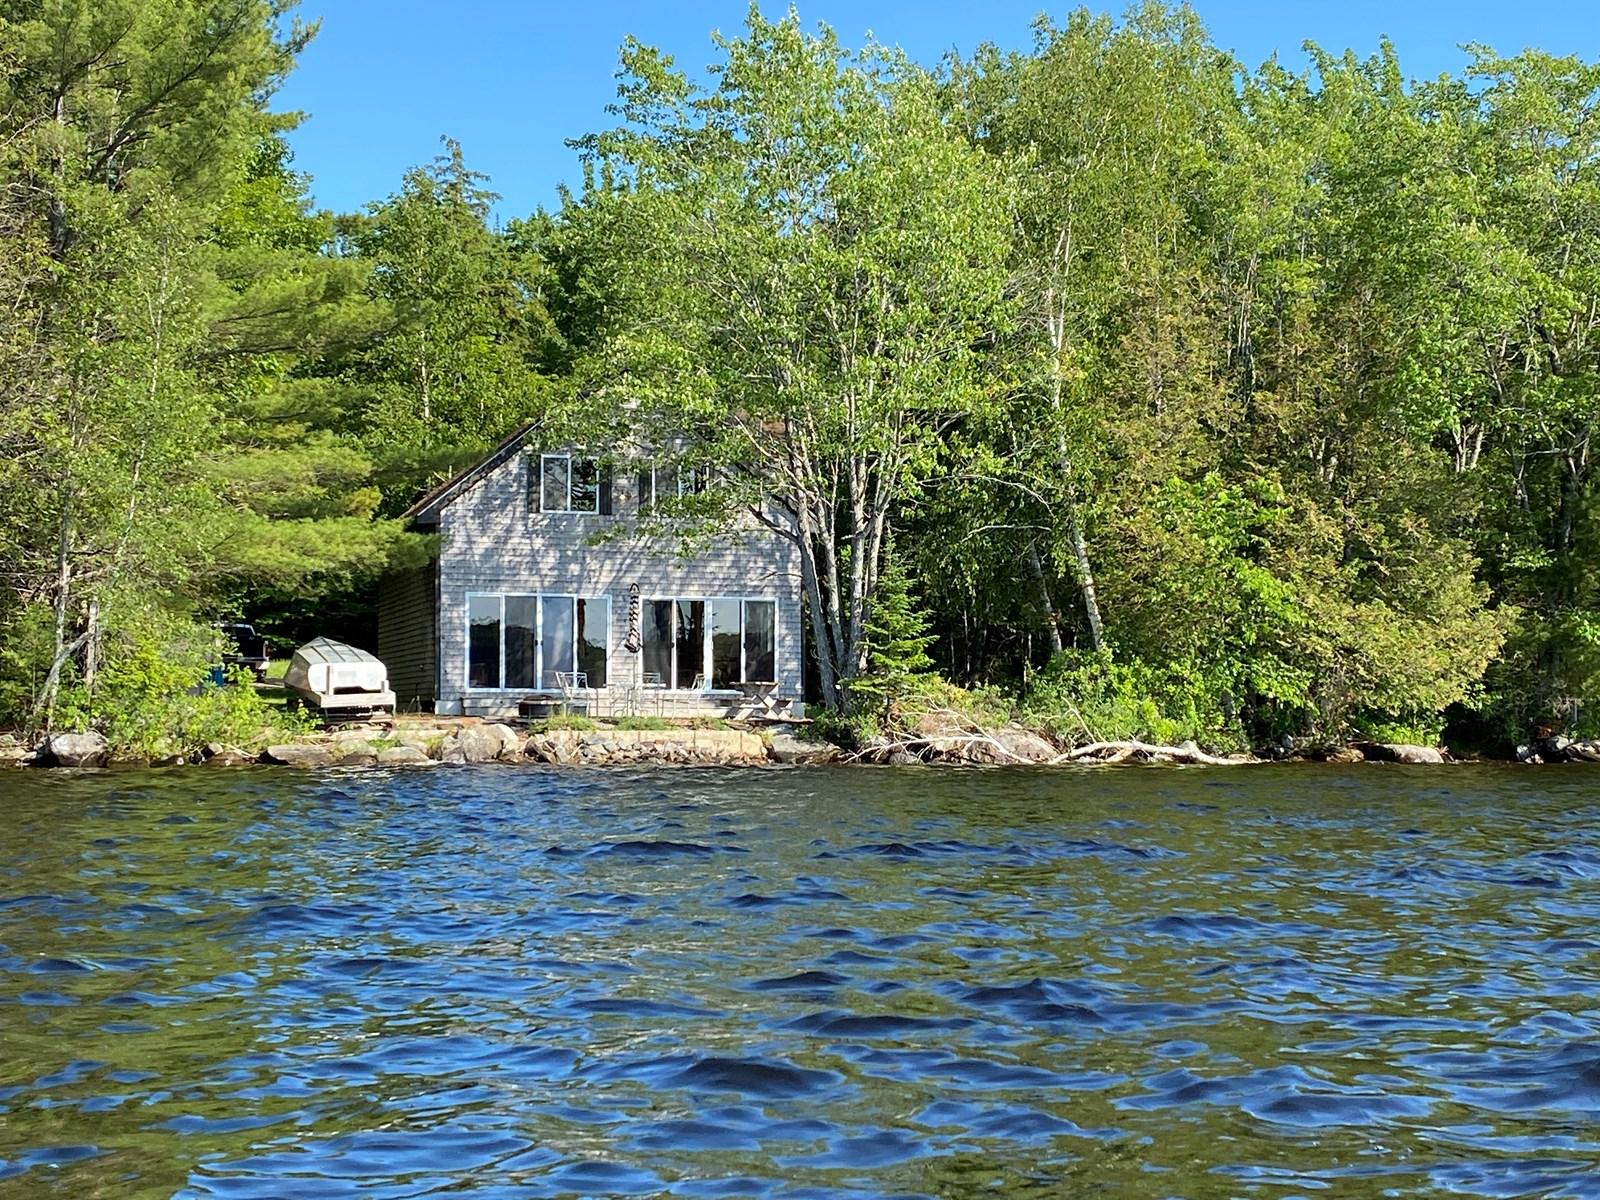 4-Season Camp for Sale